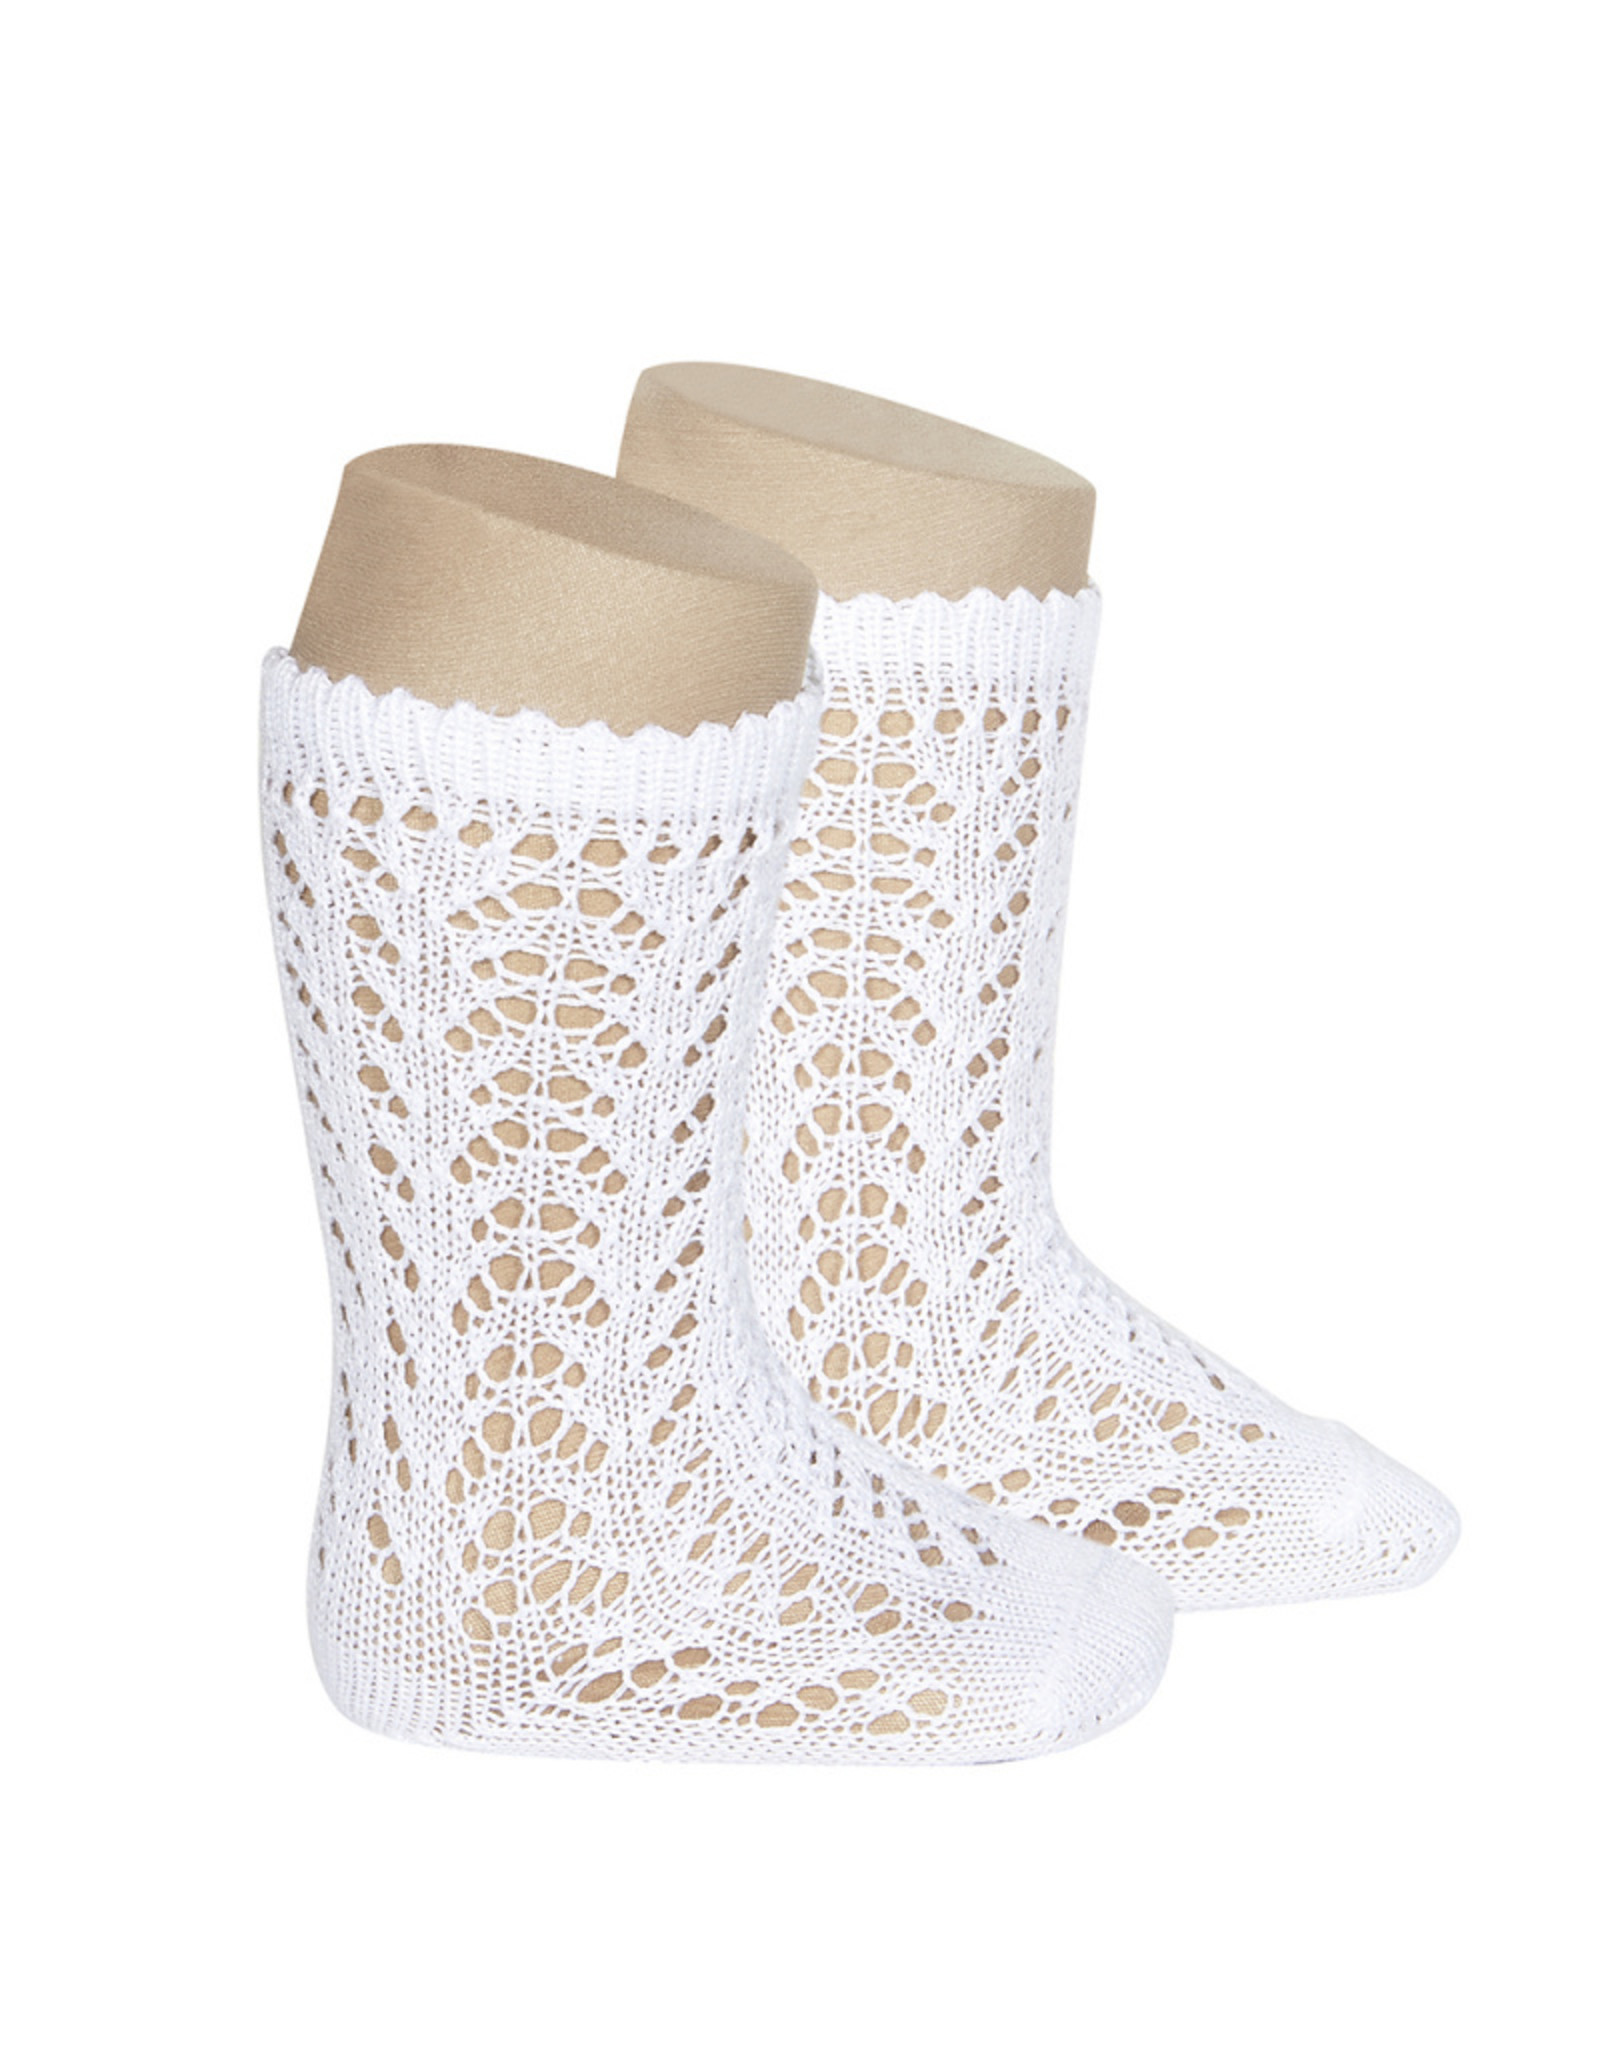 CONDOR White Openwork Knee Socks